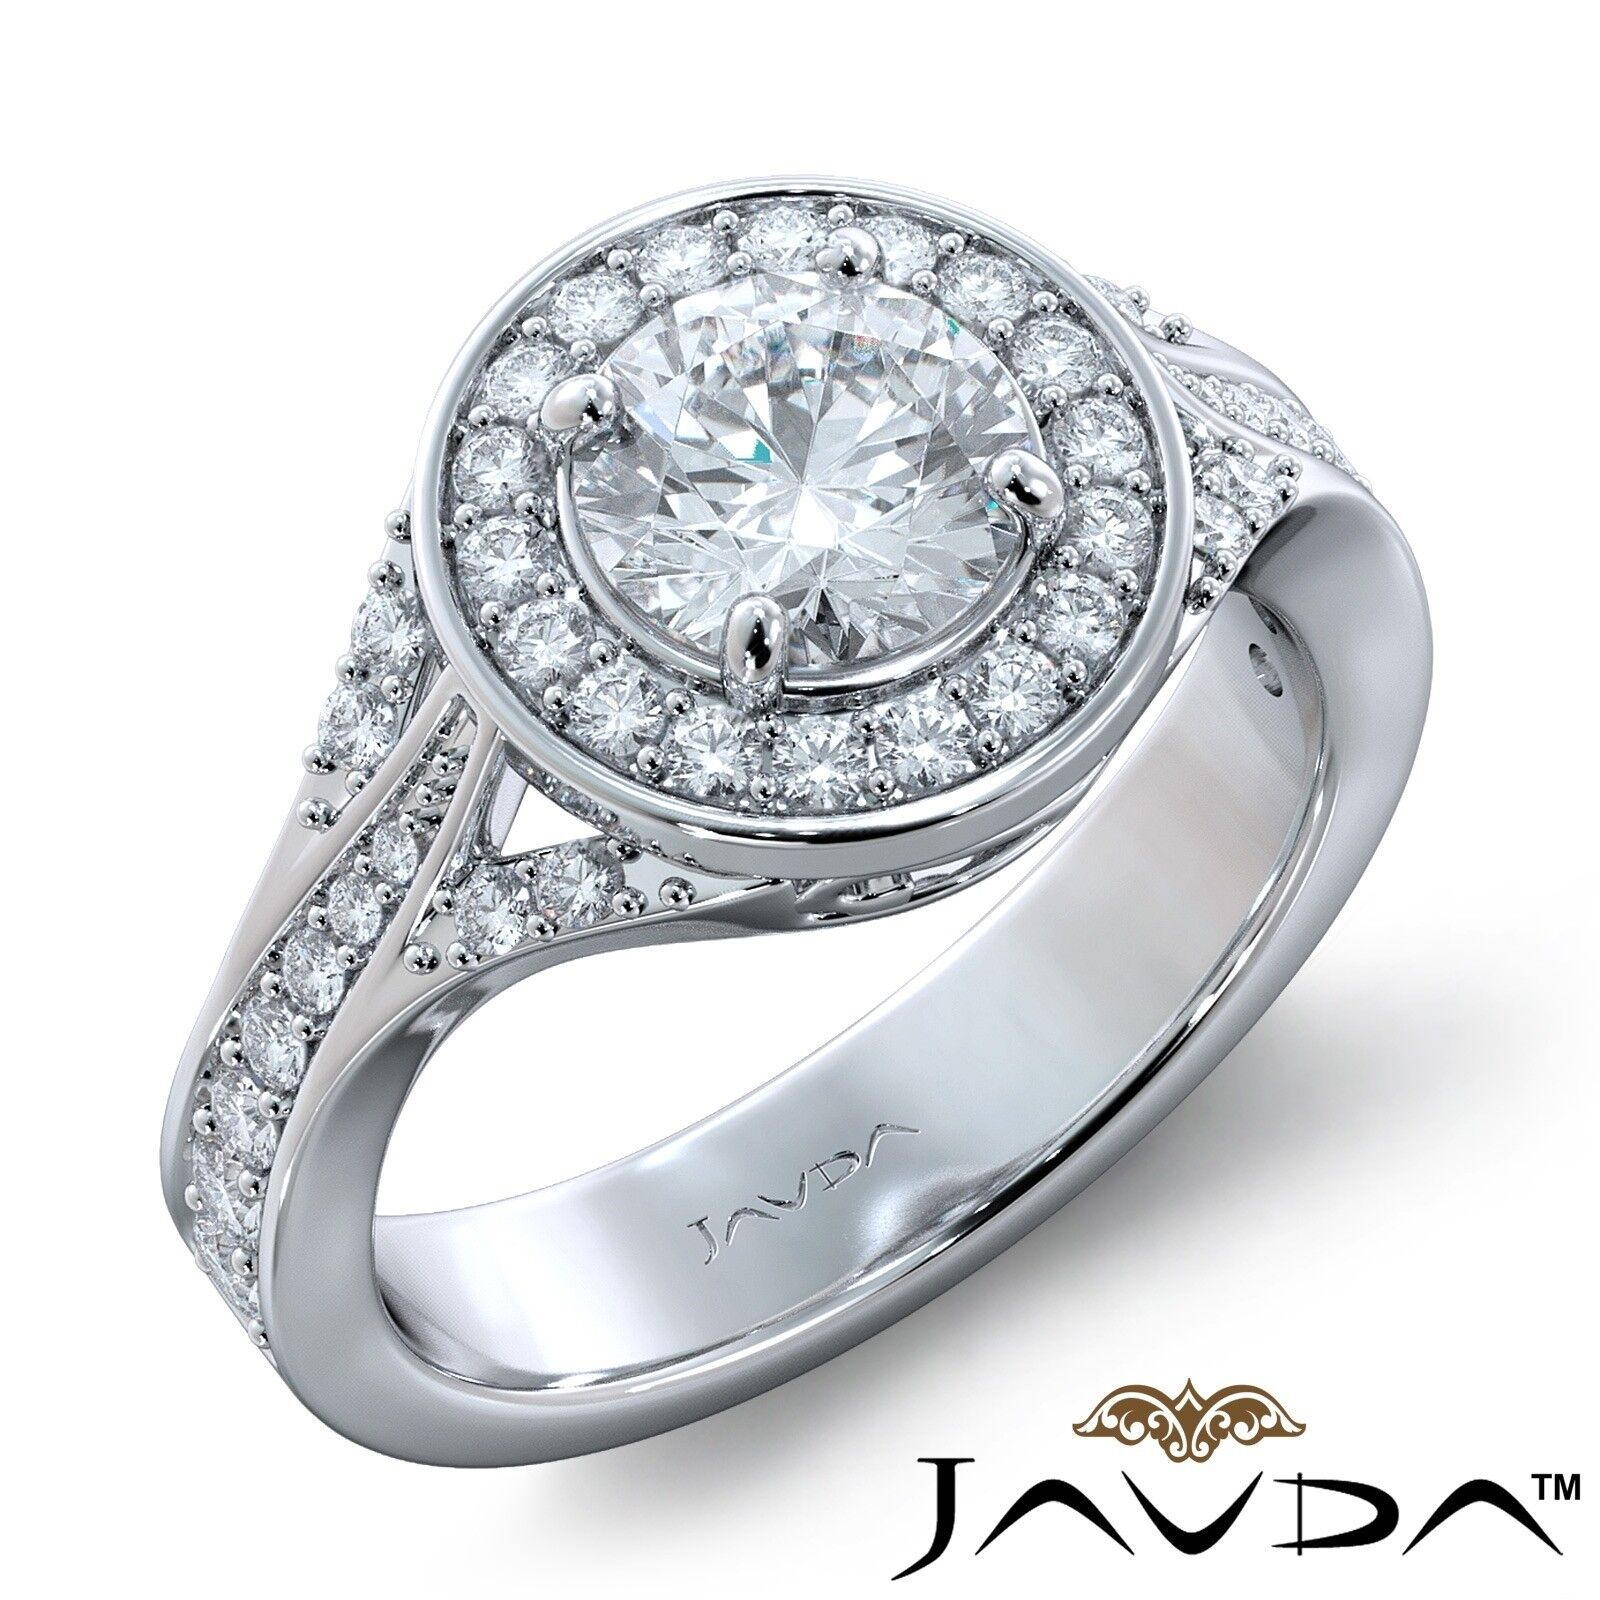 3.45ctw Halo Sidestone Pave Round Diamond Engagement Ring GIA I-SI1 White Gold